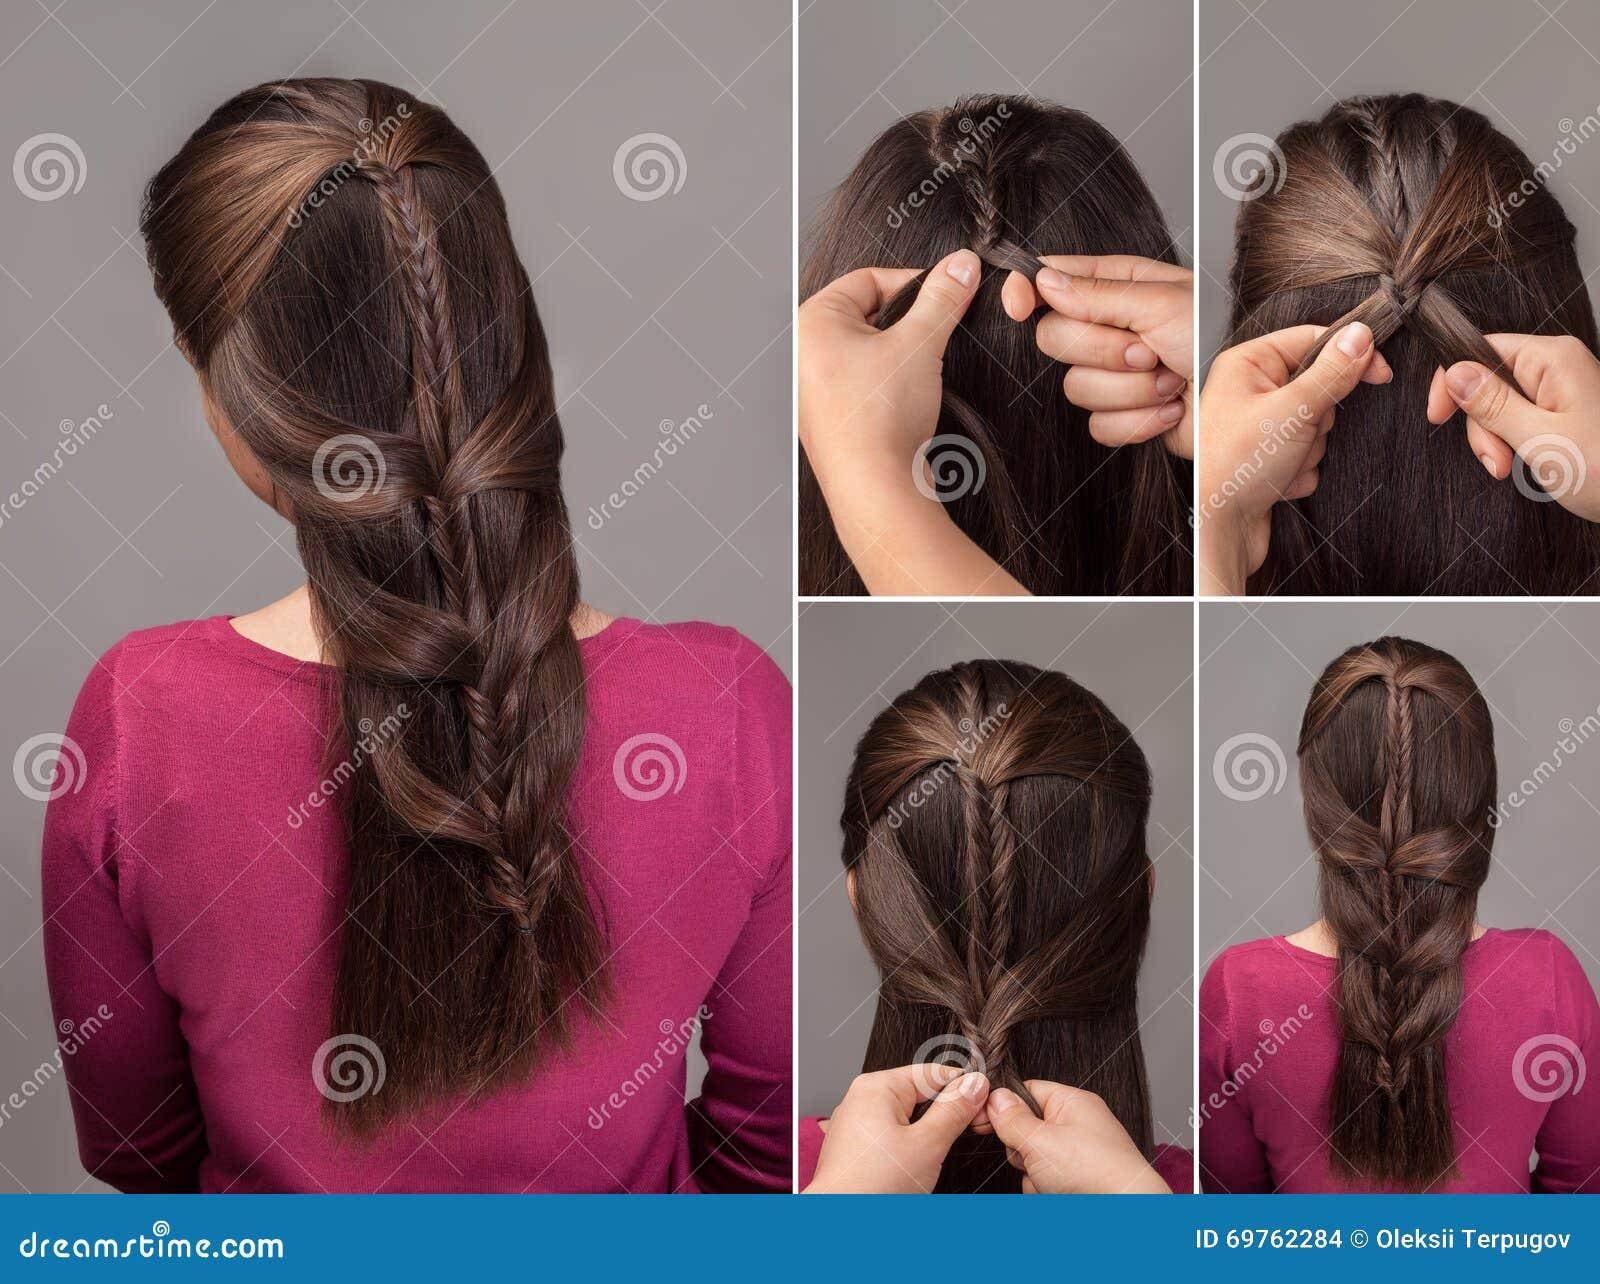 Braid Hairstyle Tutorial Stock Photo - Image: 69762284 - Fishtail Hairstyle